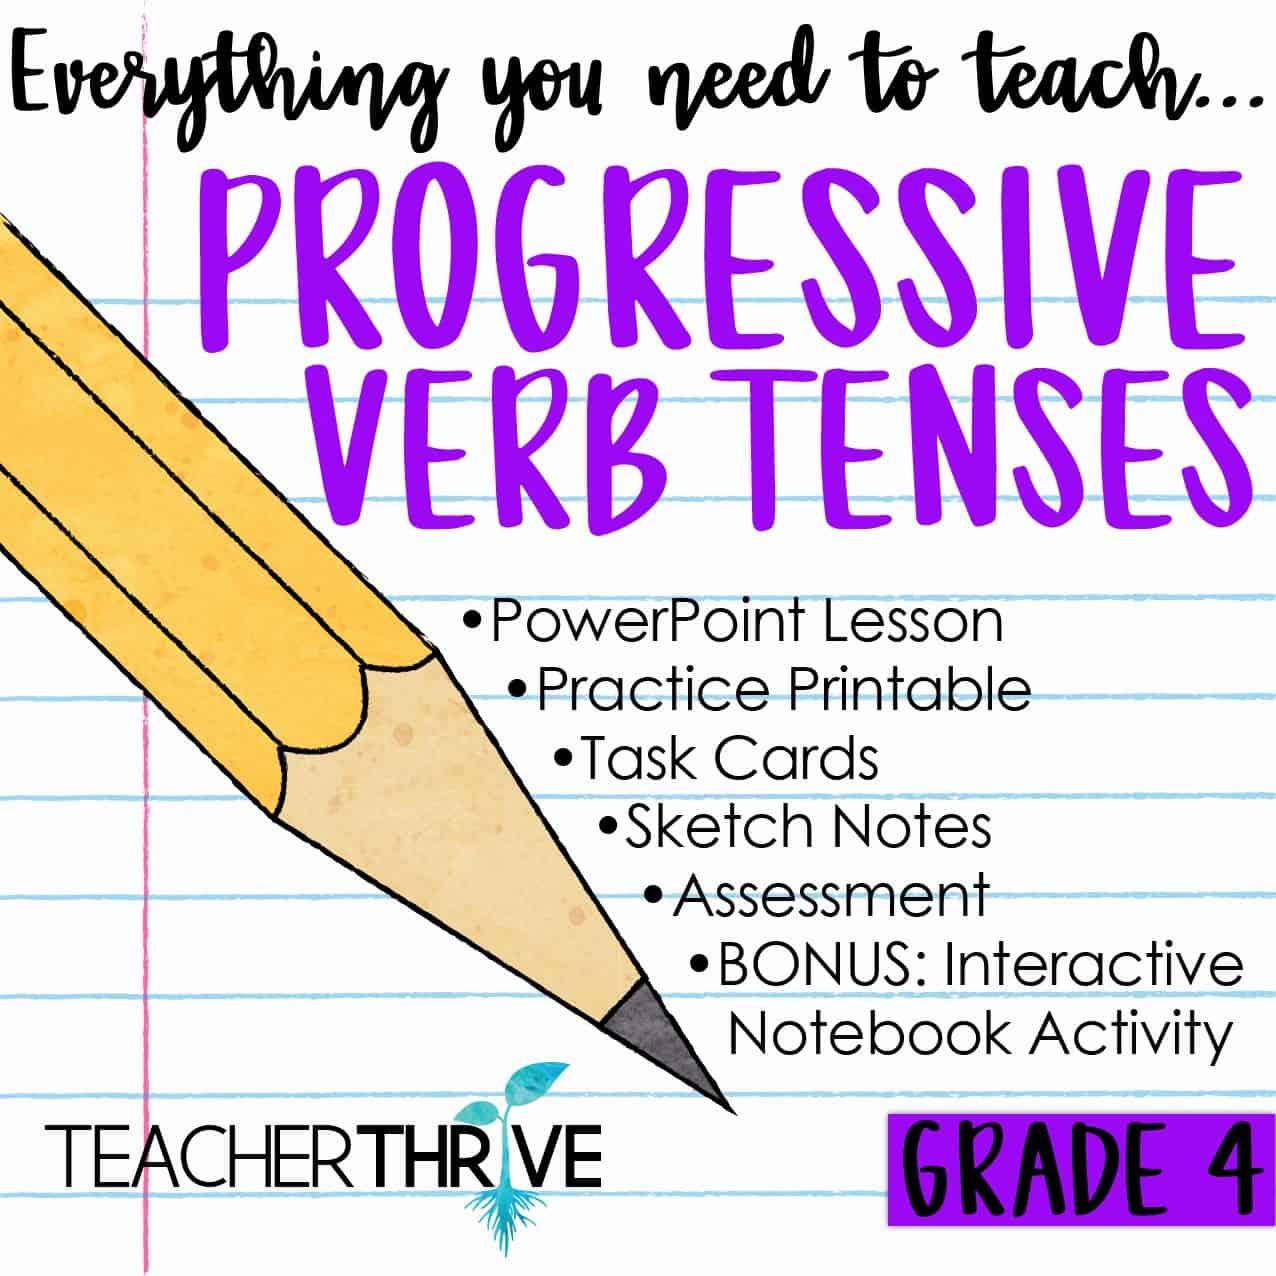 hight resolution of Teaching Progressive Verb Tenses • Teacher Thrive